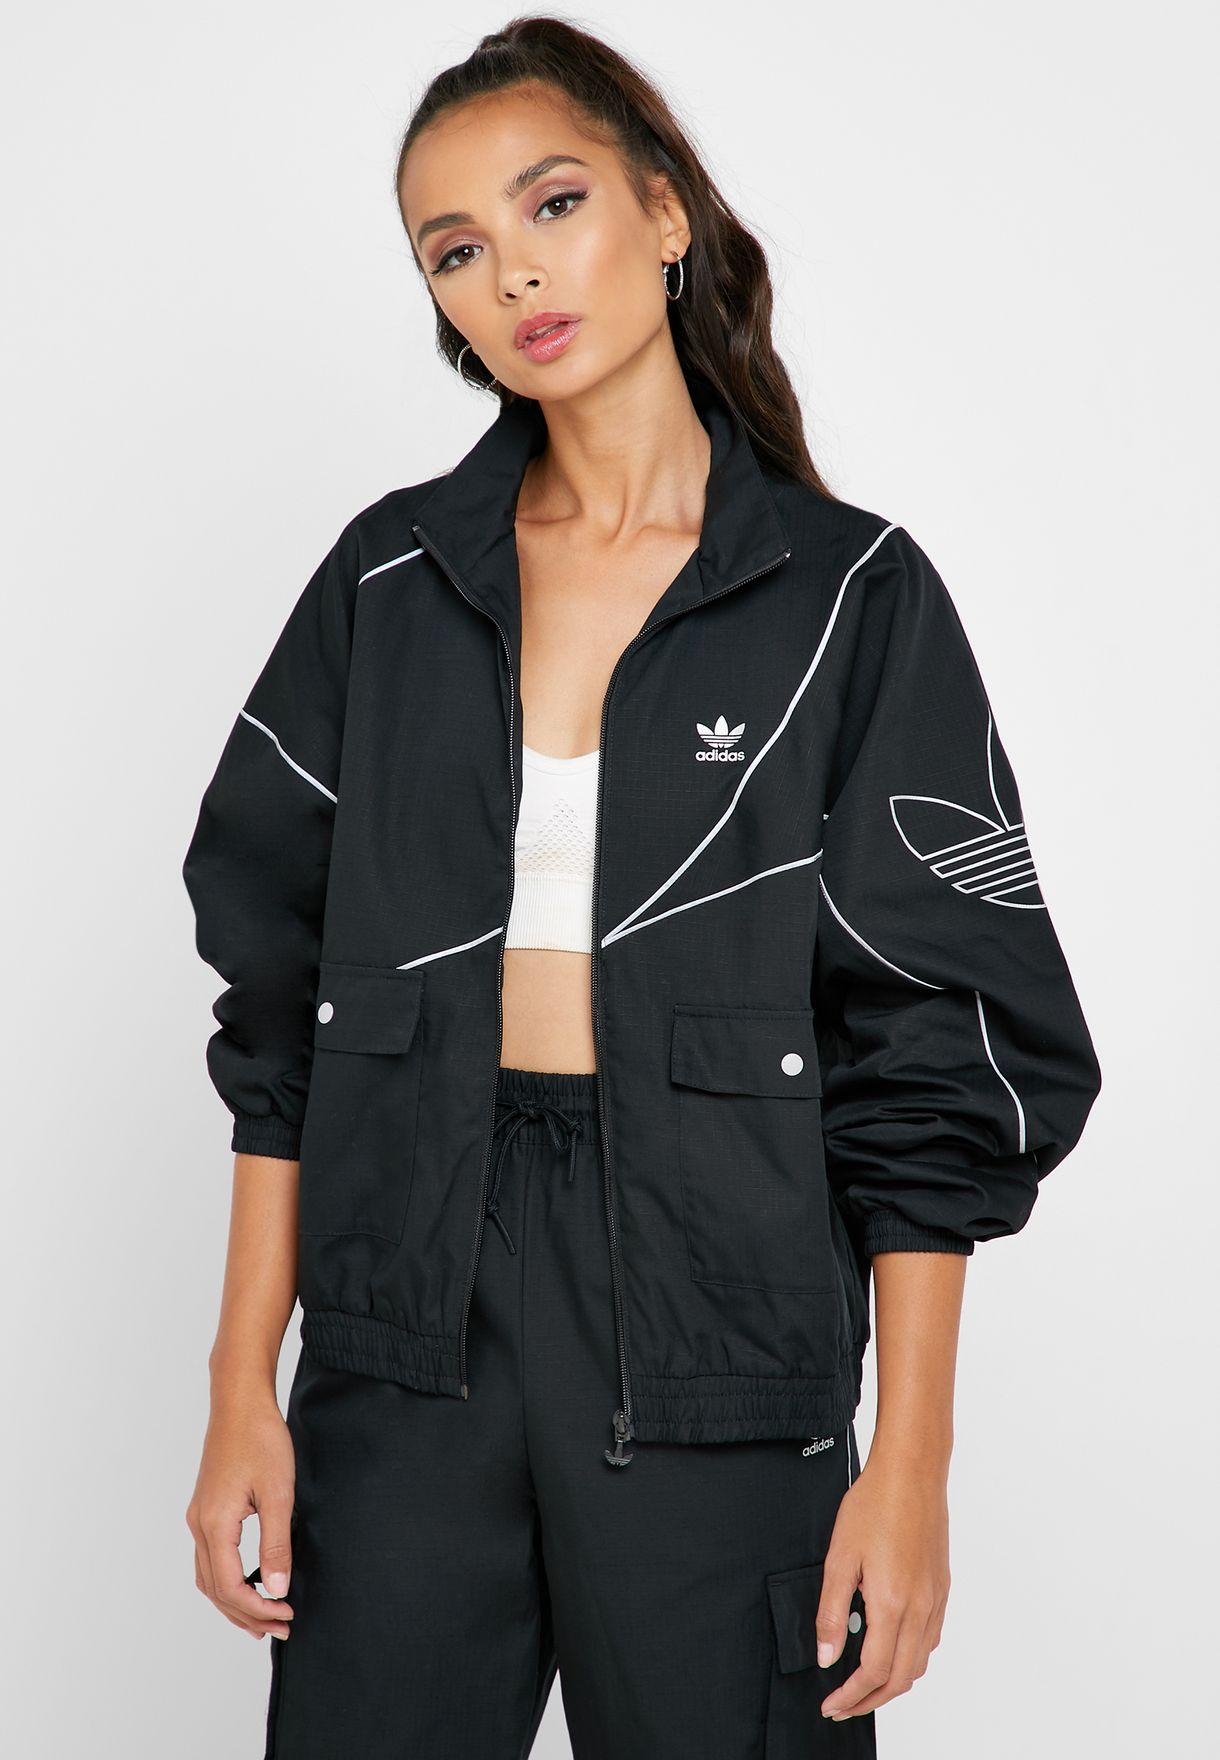 adidas originals reflective jacket